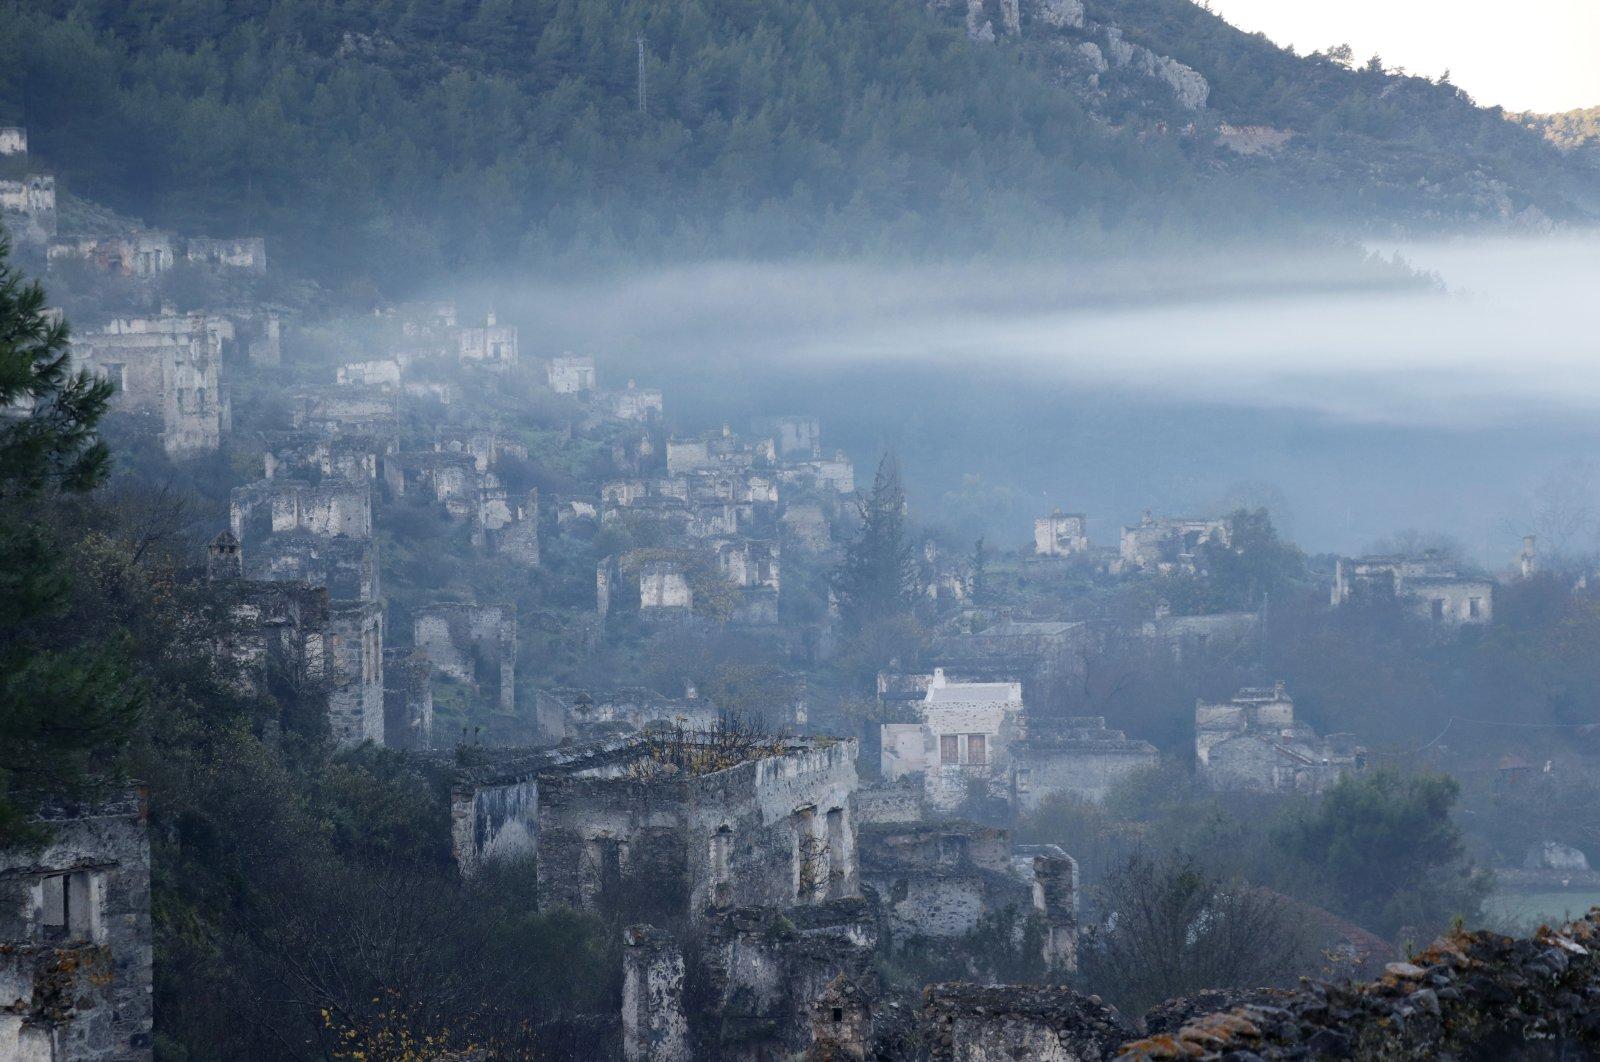 Abandoned buildings seen through fog in Kayaköy, Muğla province, Dec. 11, 2020. (AA Photo)